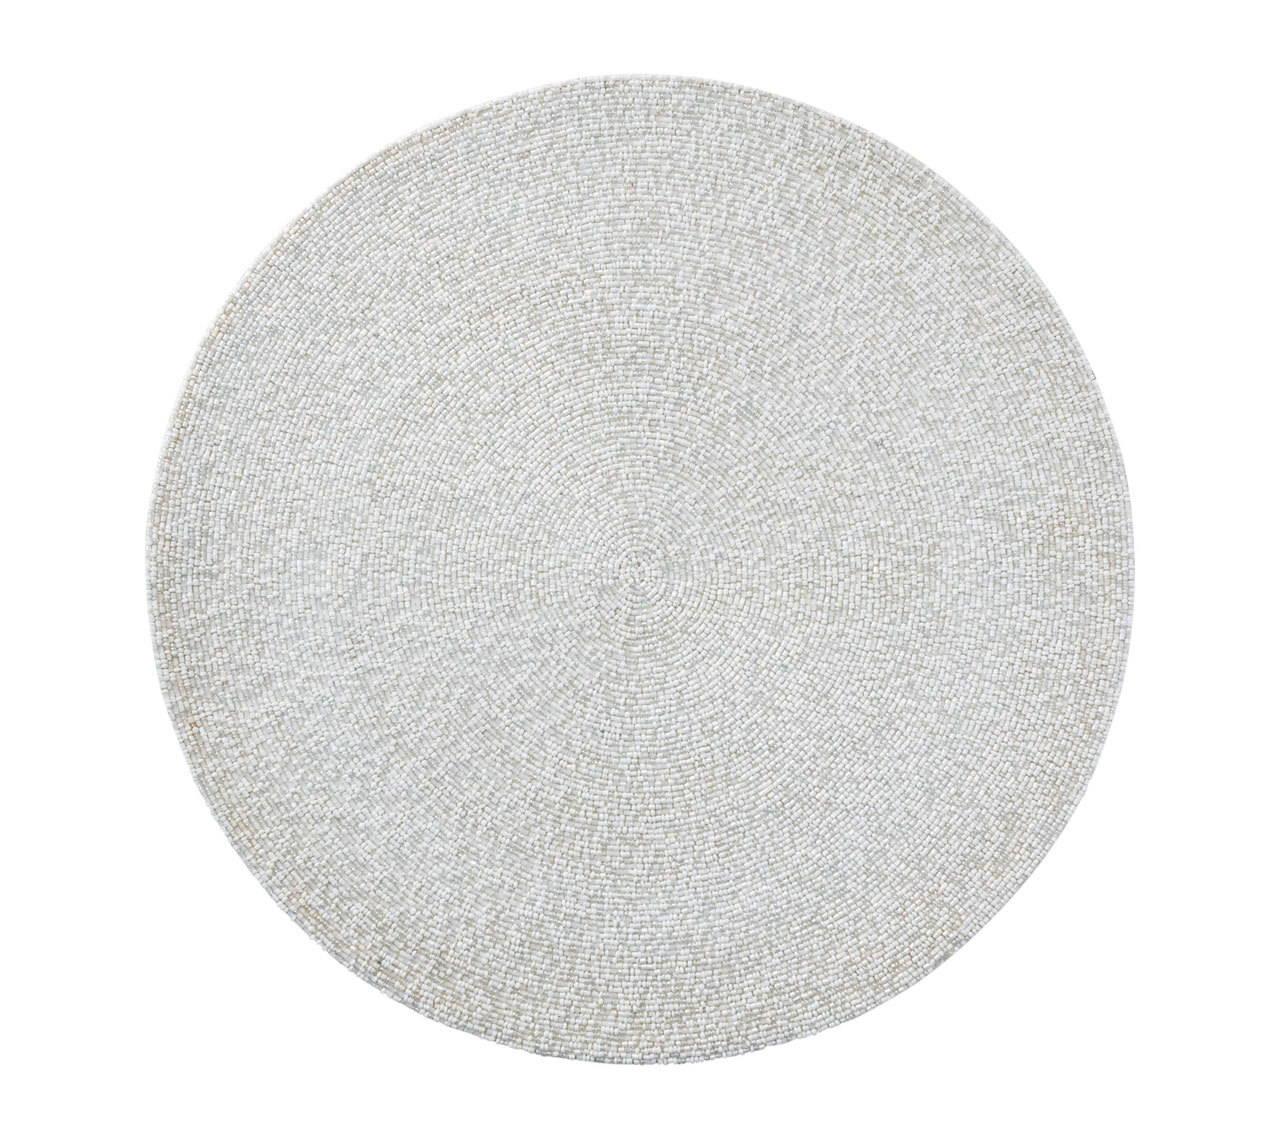 CONFETTI PLACEMAT IN WHITE